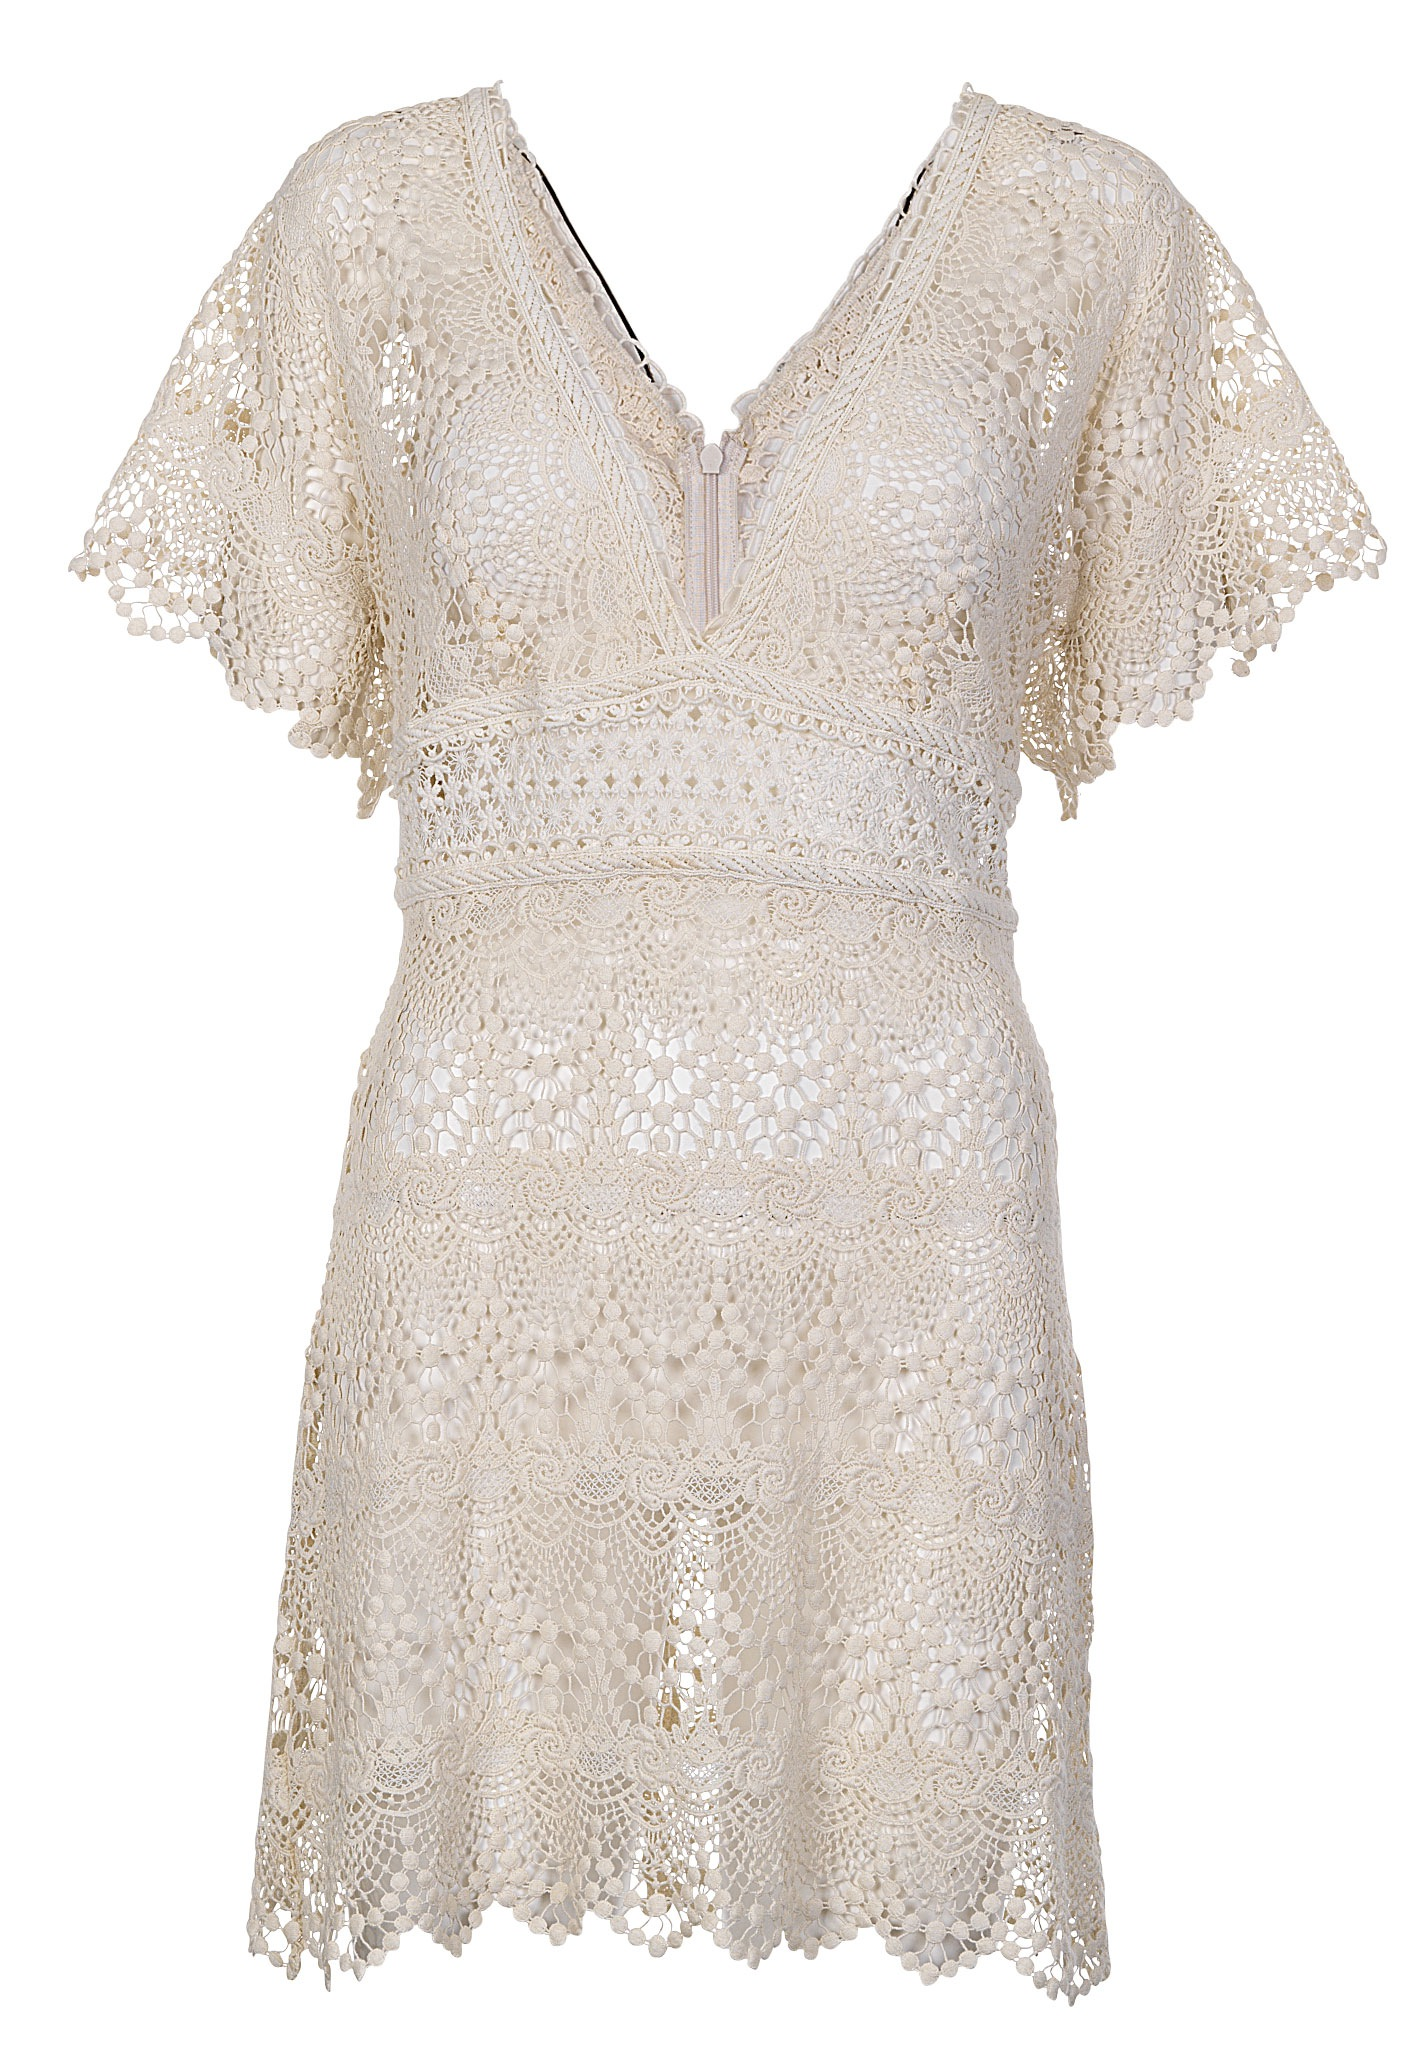 12 fine kjoler til nyttårsaften | Costume.no